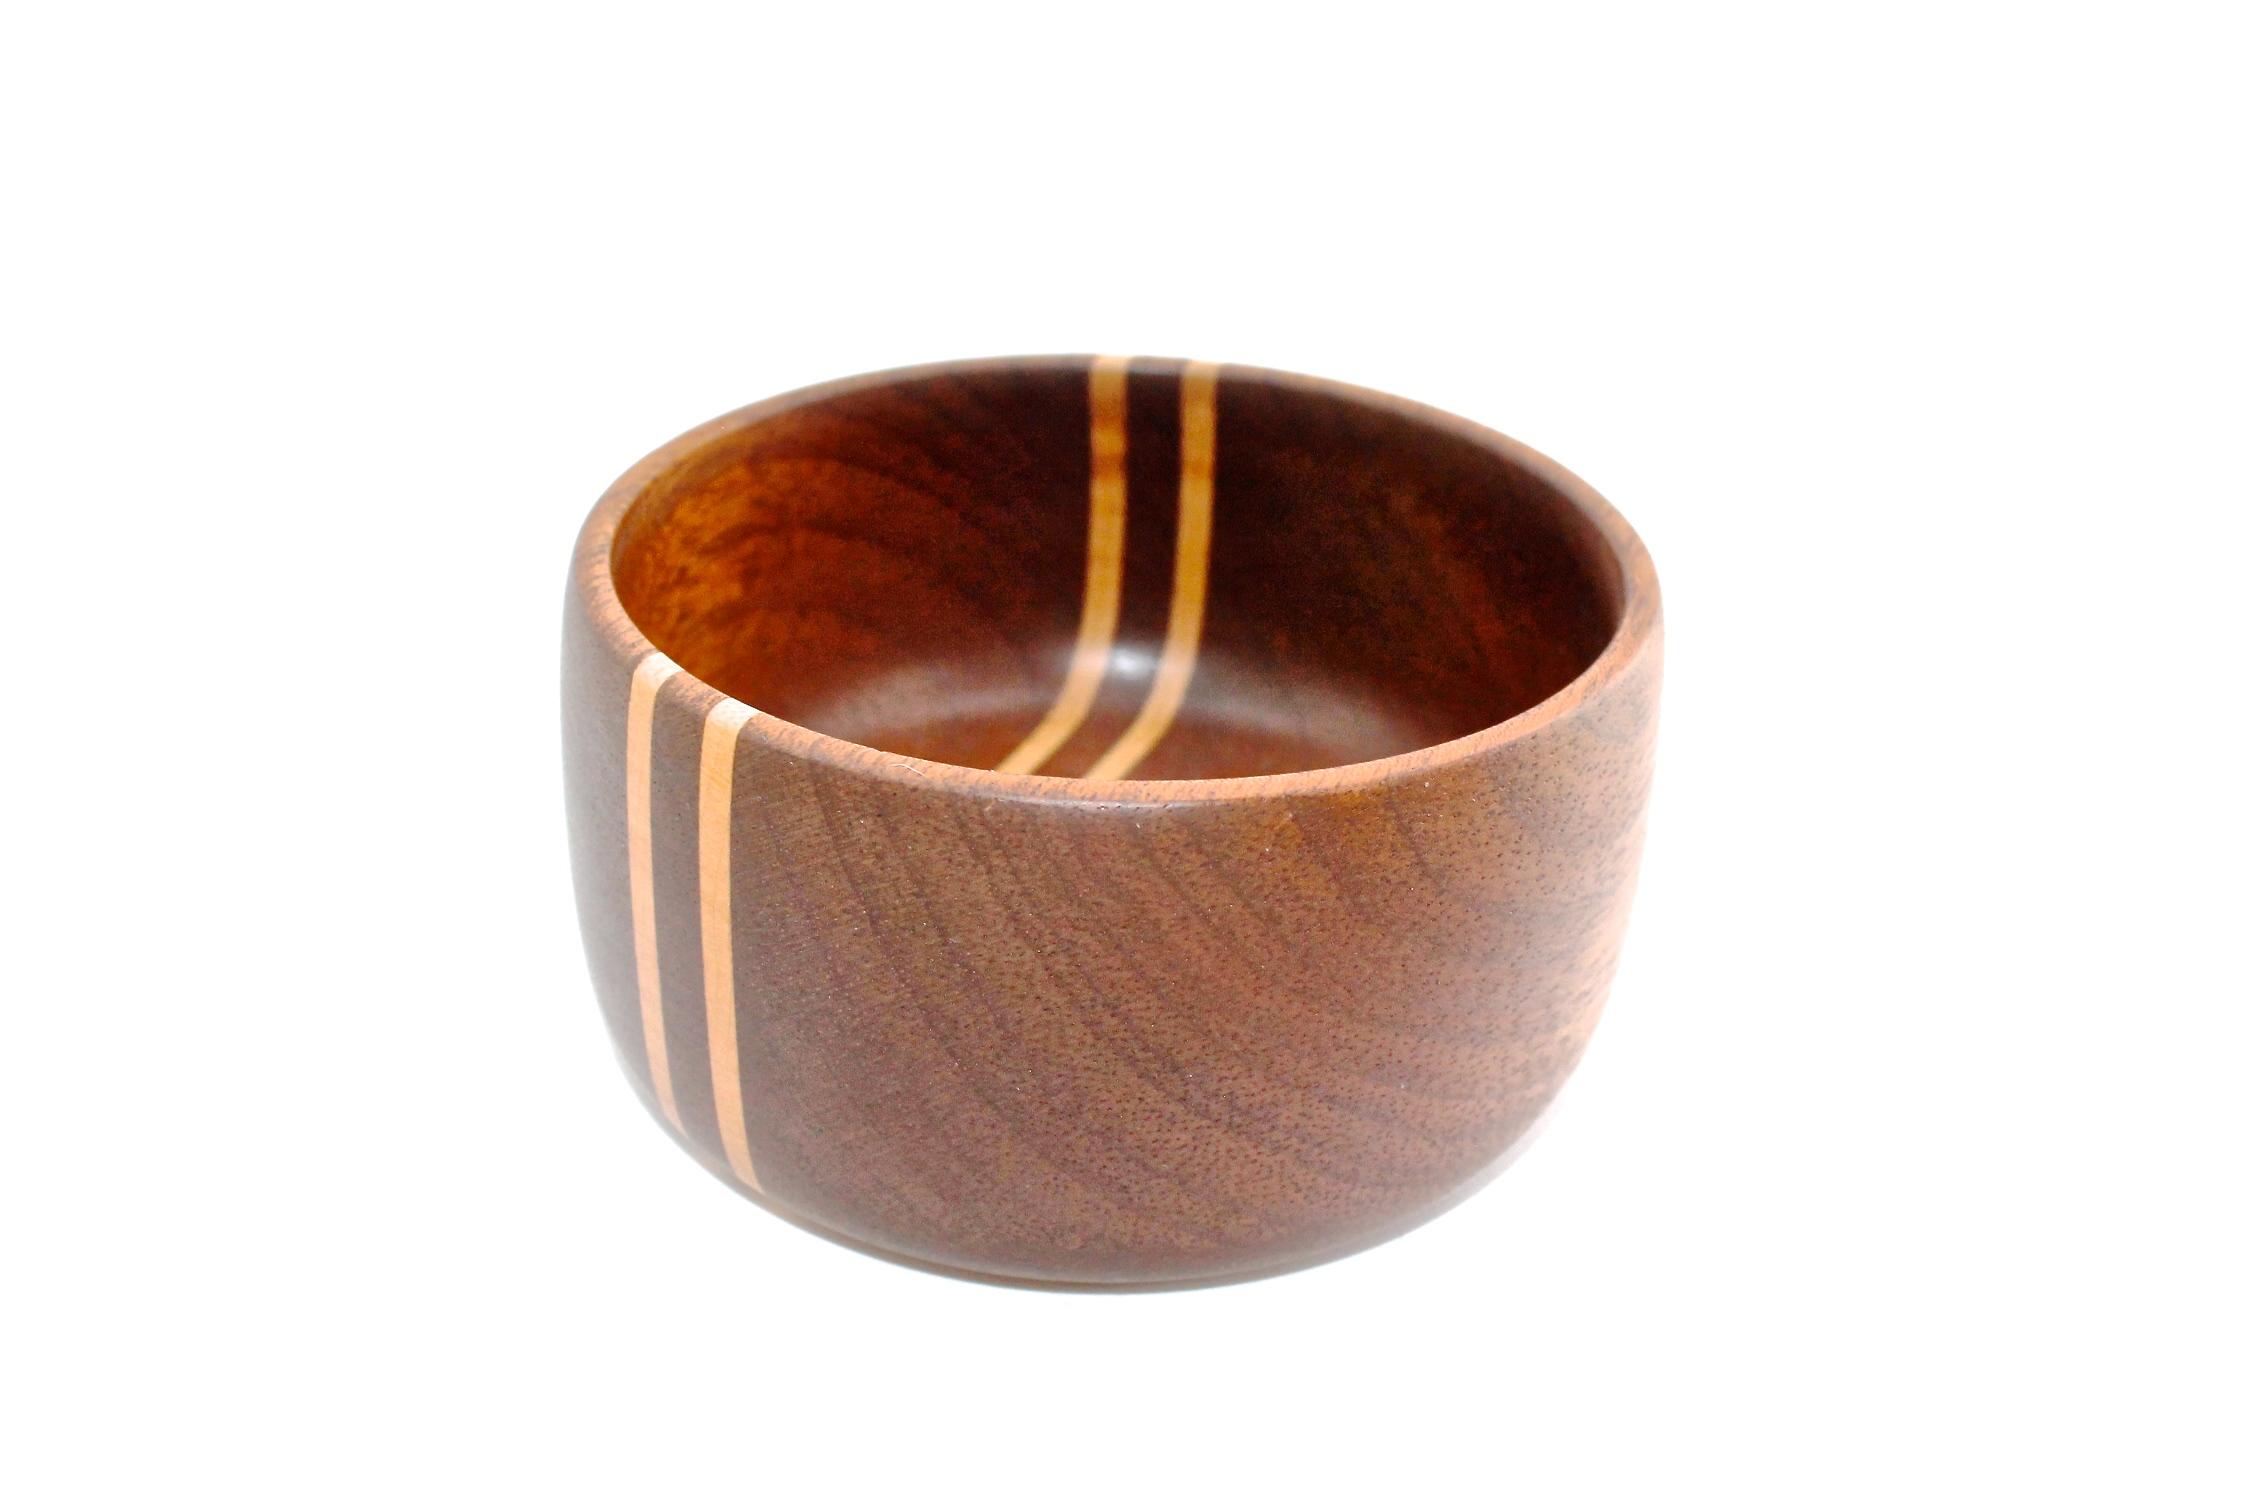 Stipe Mahogany Bowl